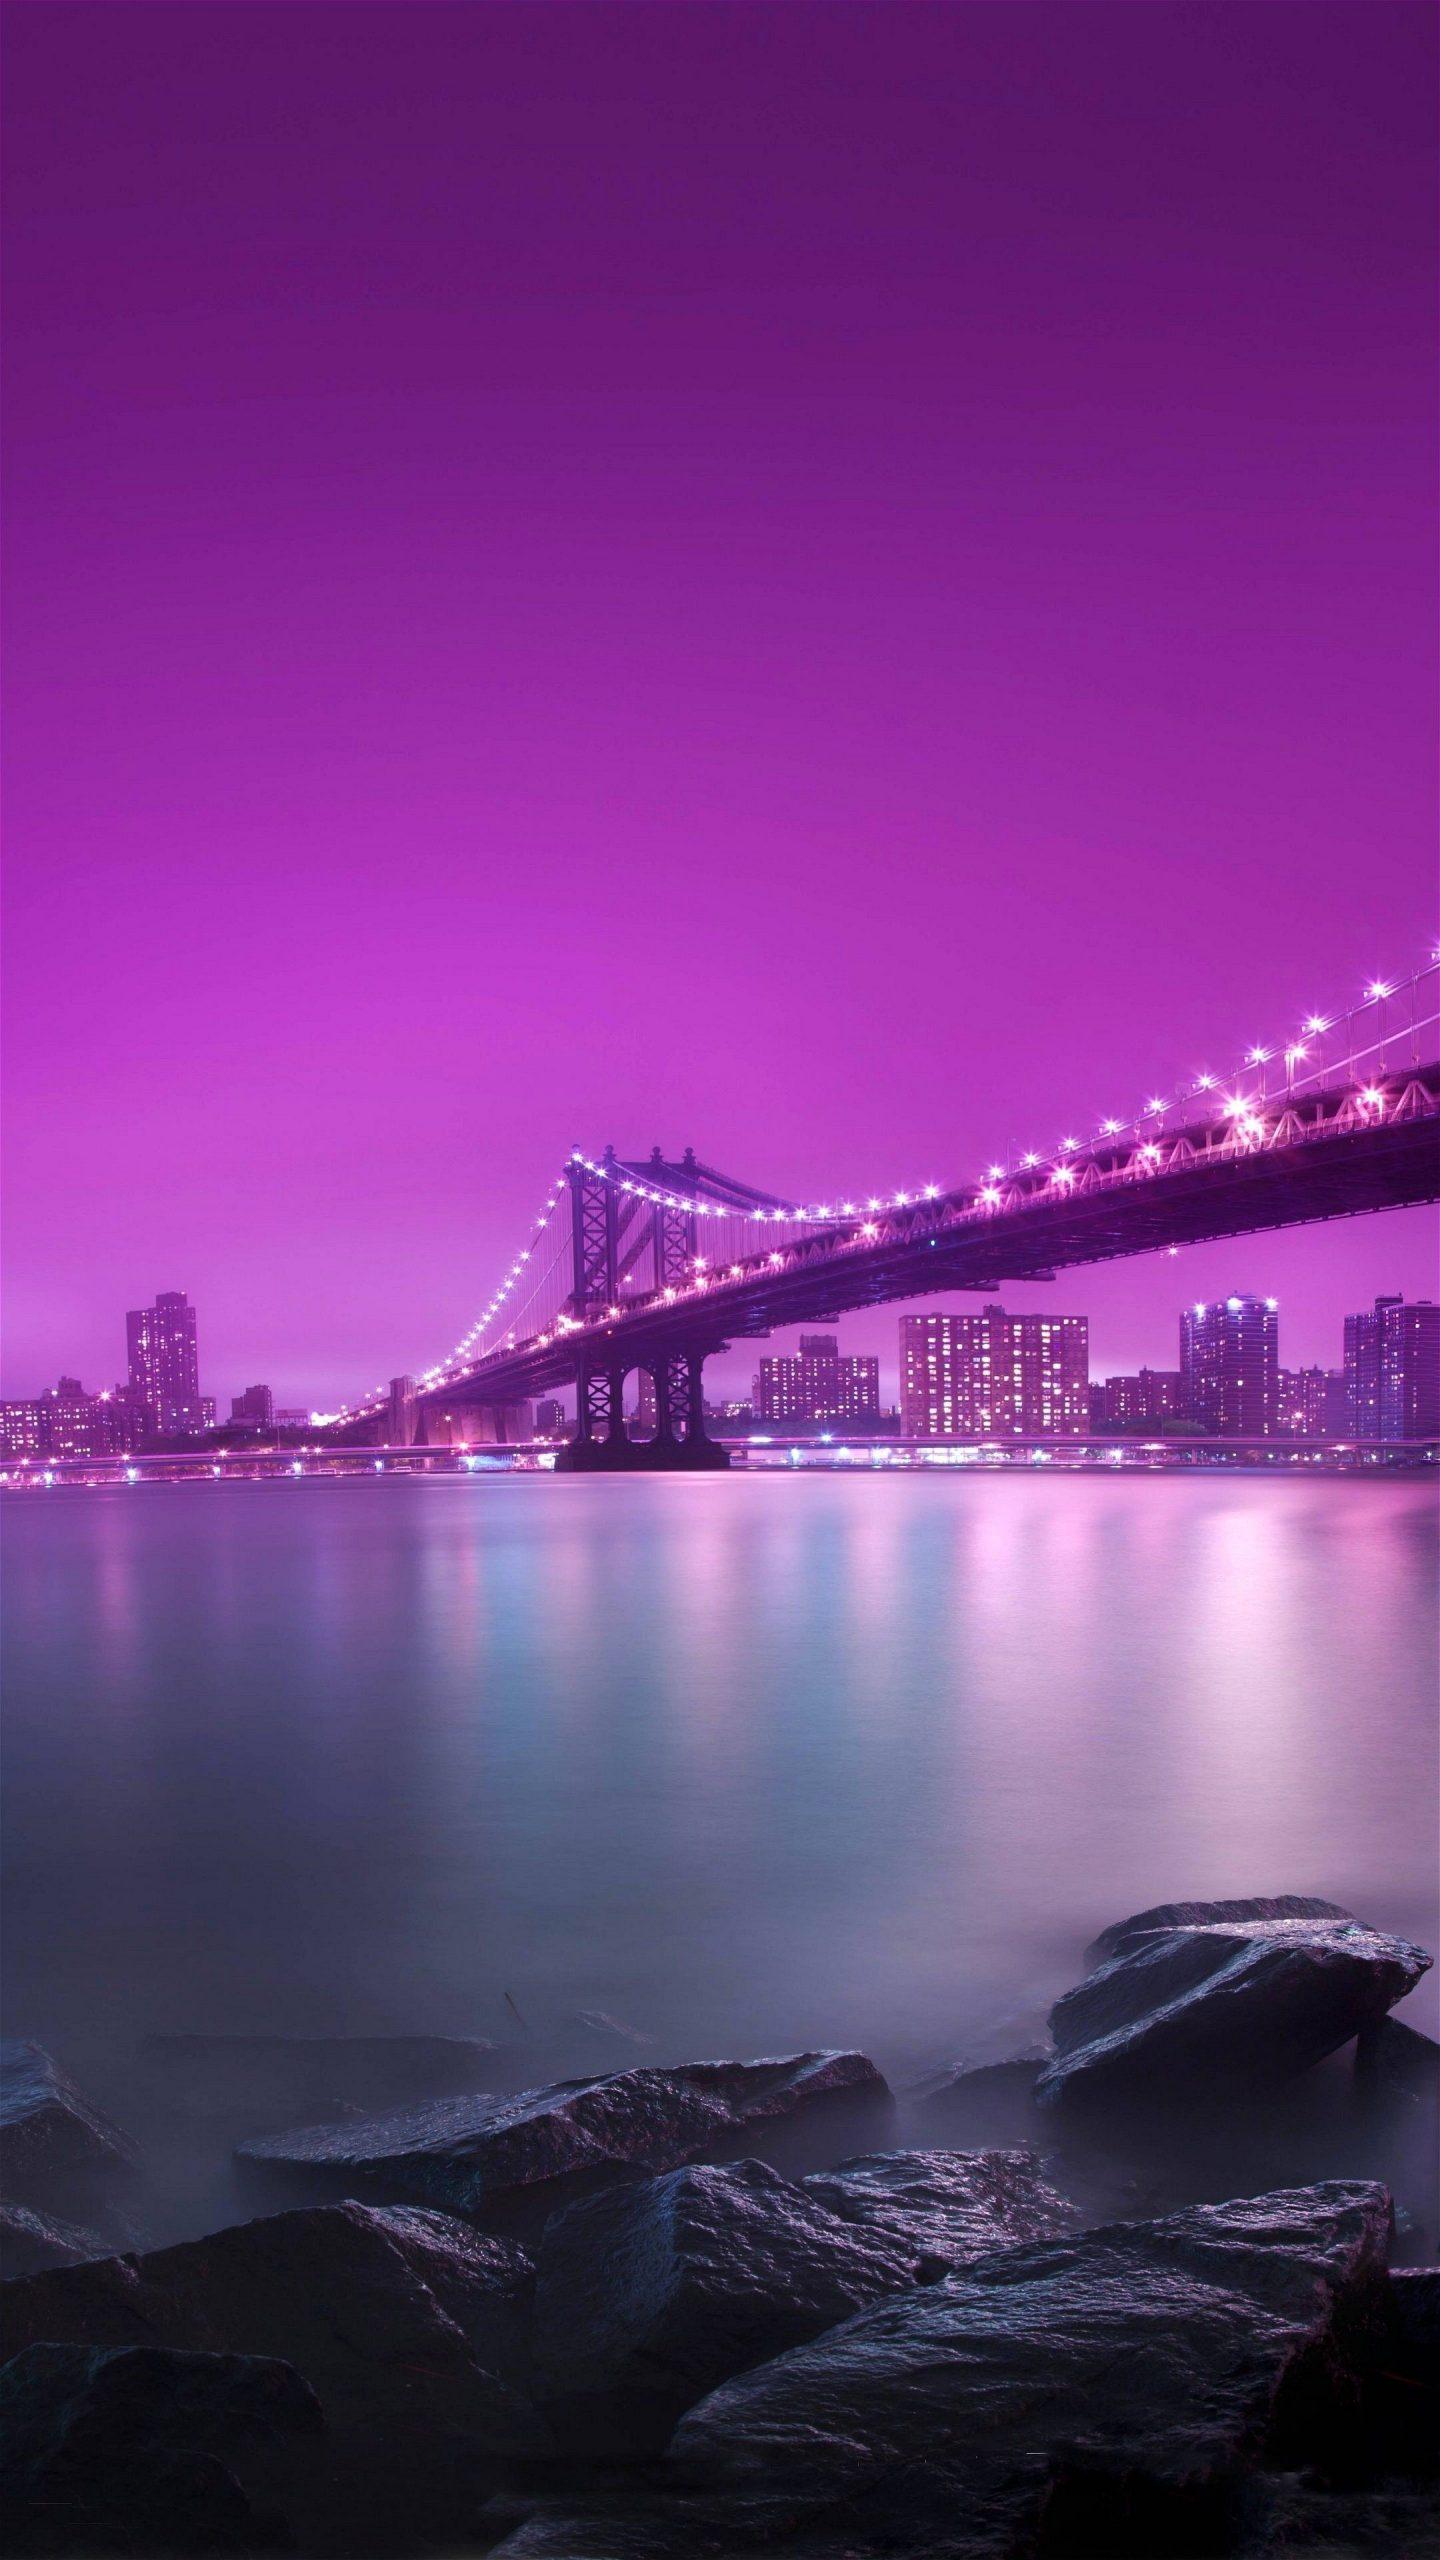 Bridge HD 4K Wallpaper Mobile scaled